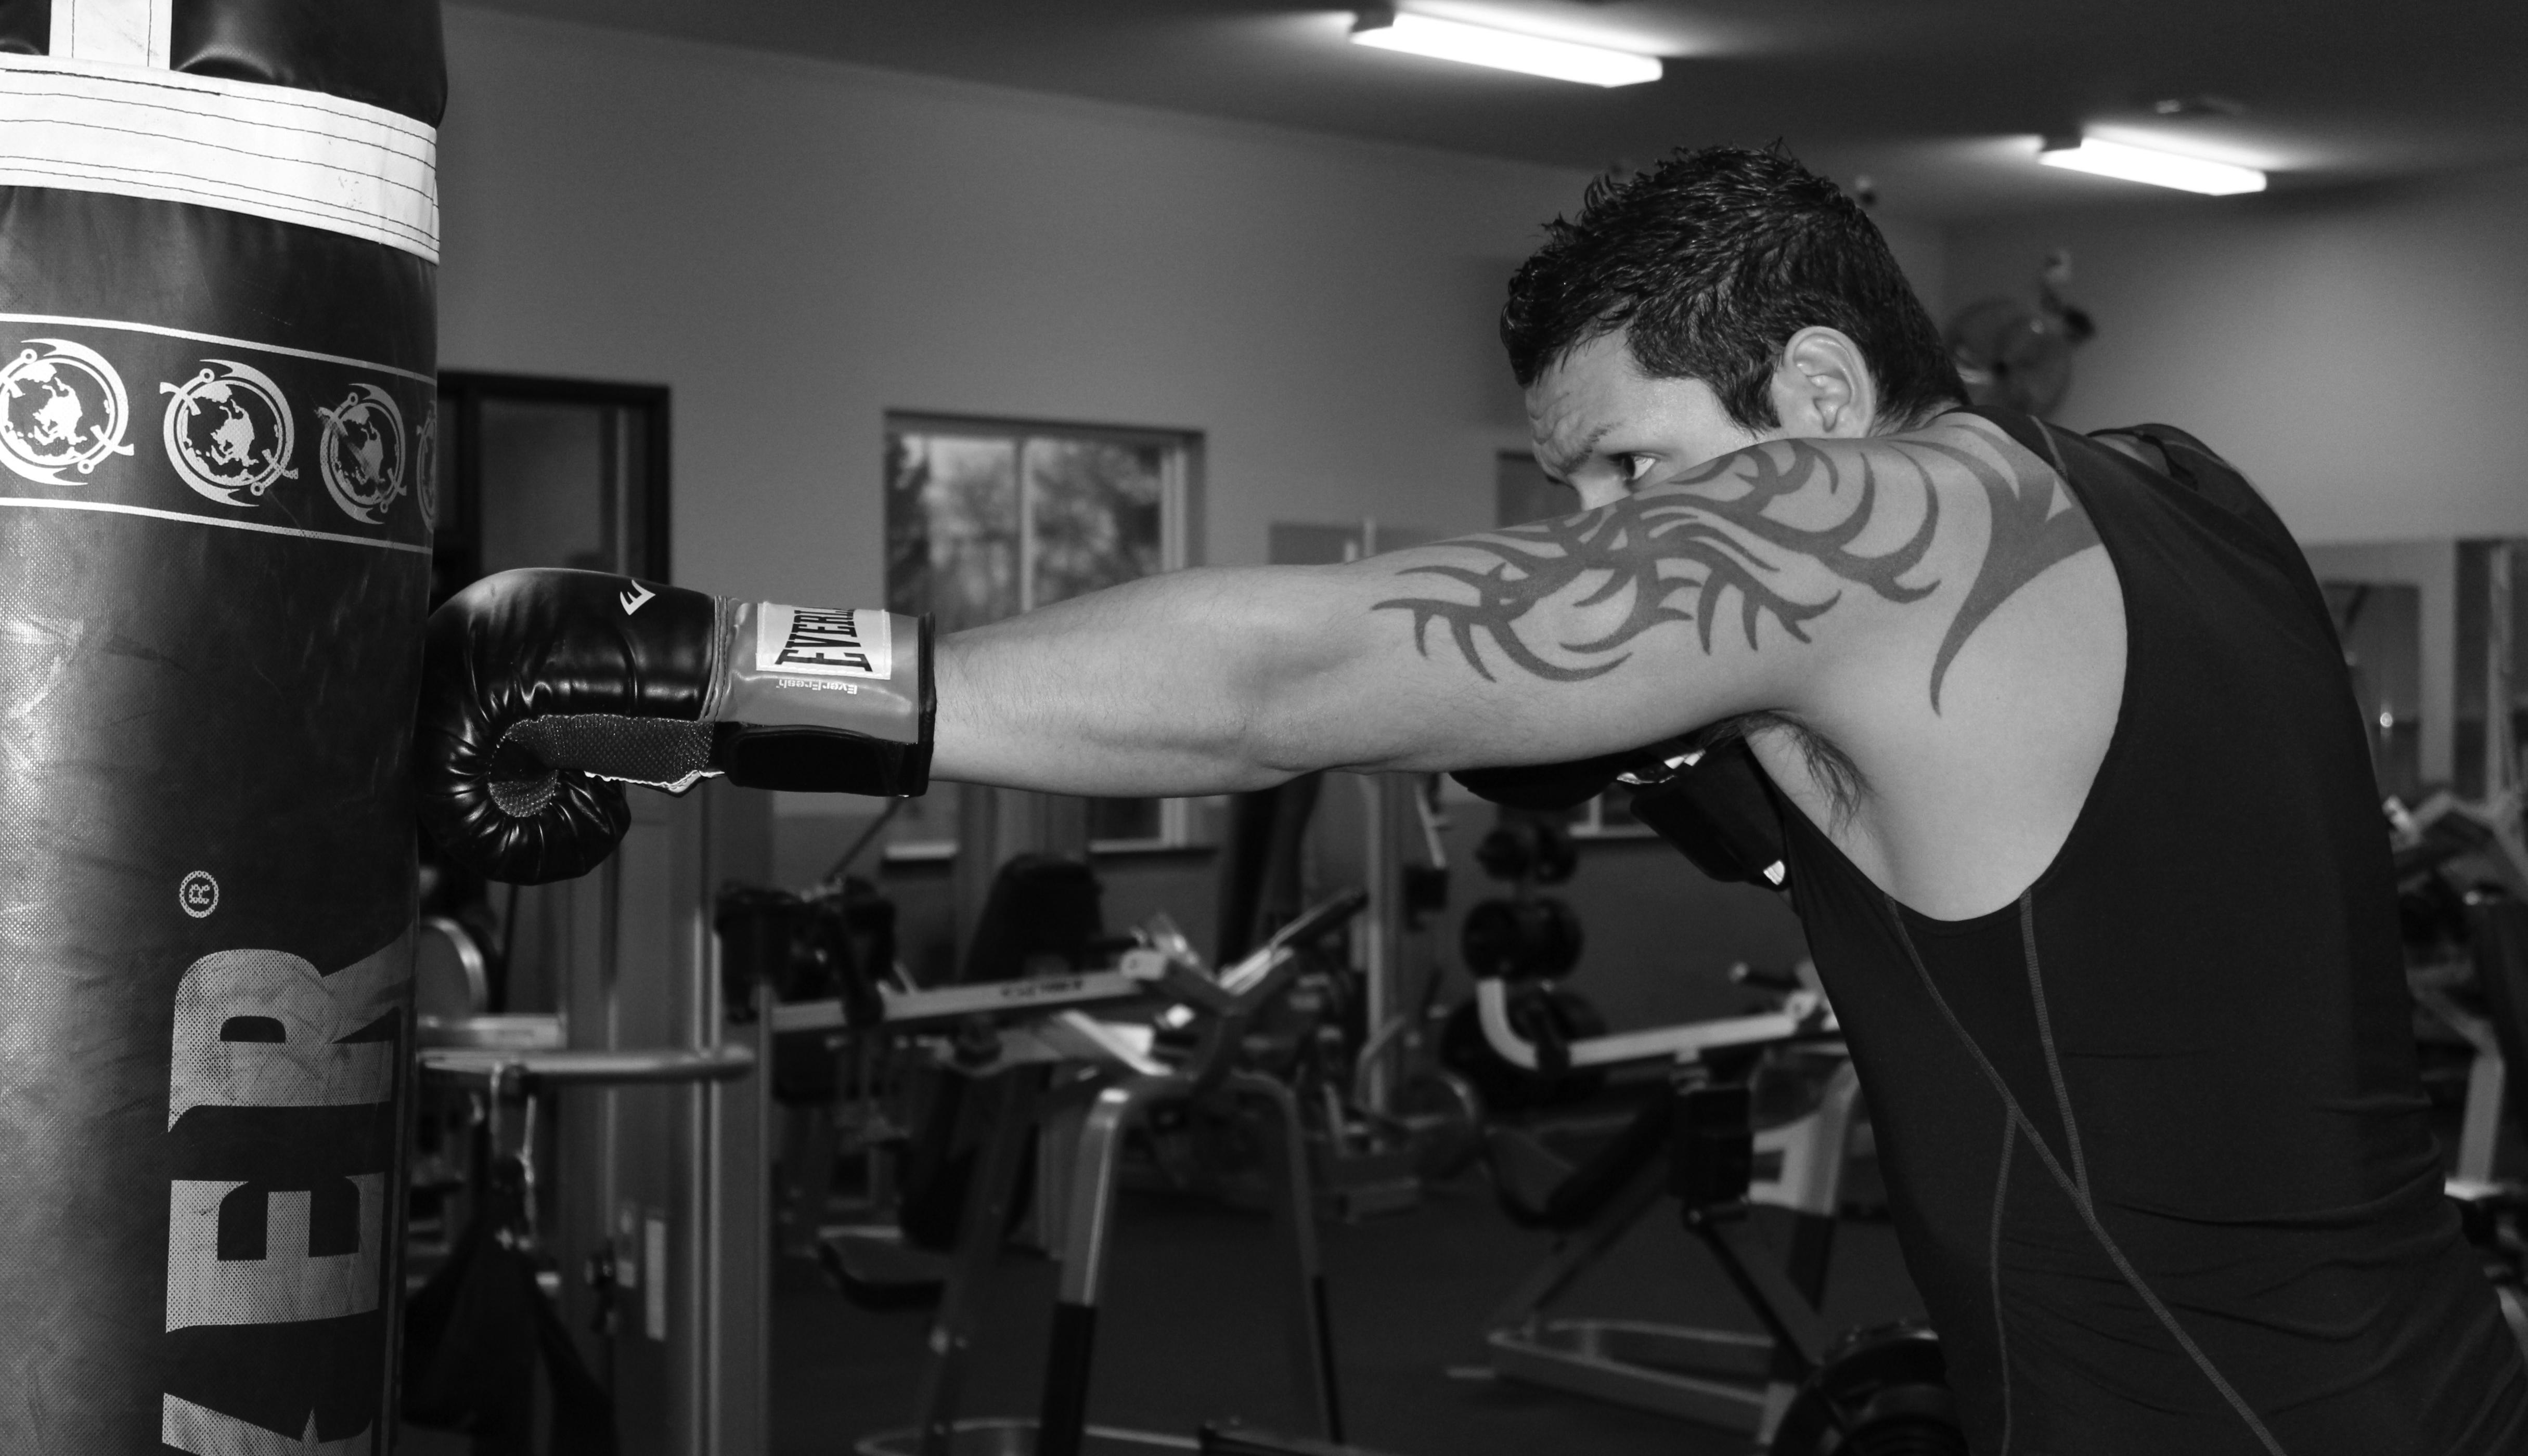 Corso Fitness Punching Bag